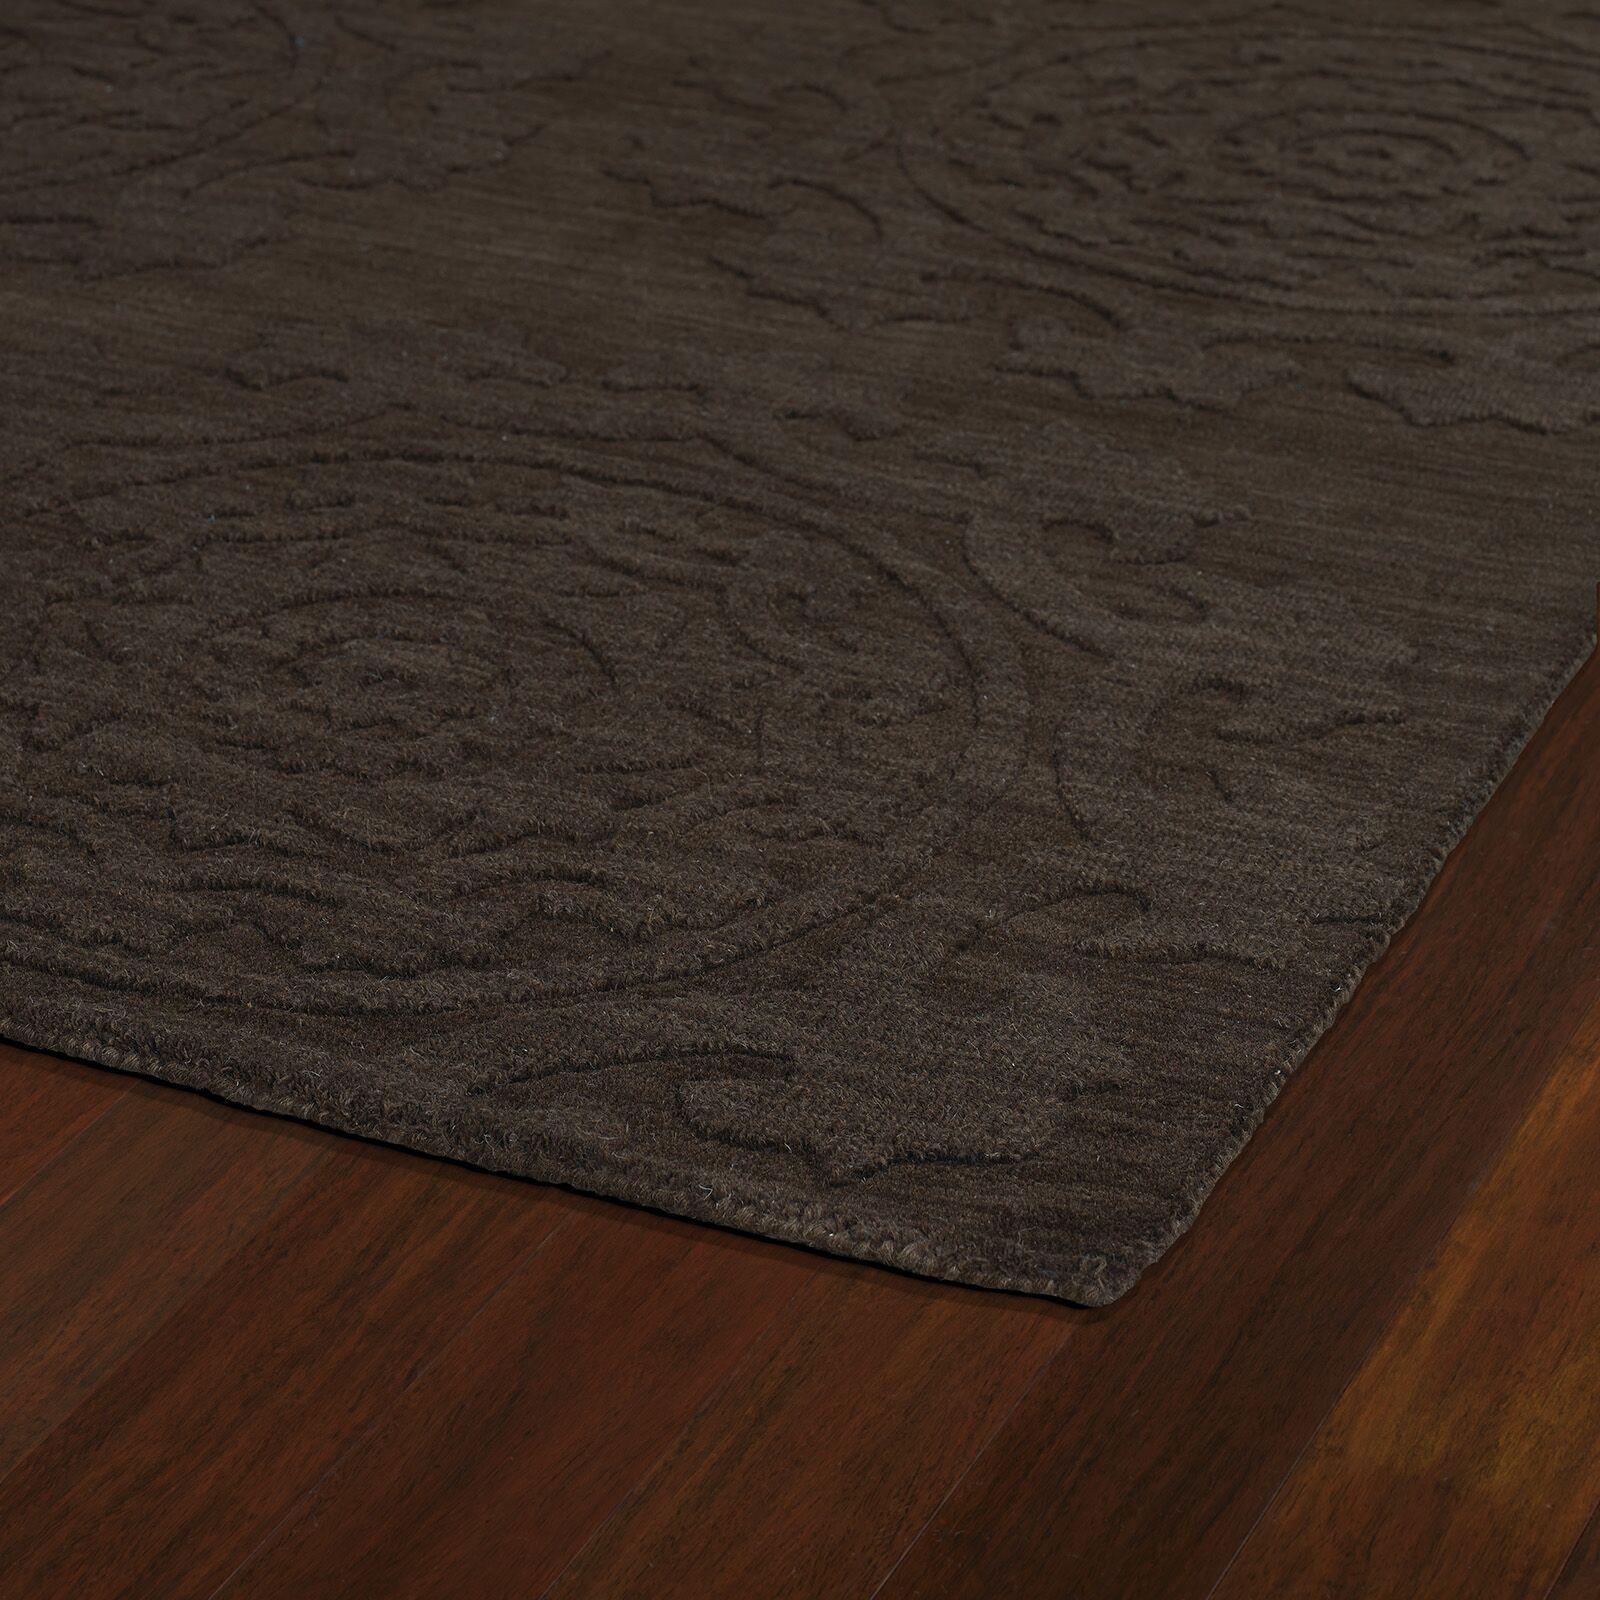 Ouinane Chocolate Solid Area Rug Rug Size: Rectangle 9'6